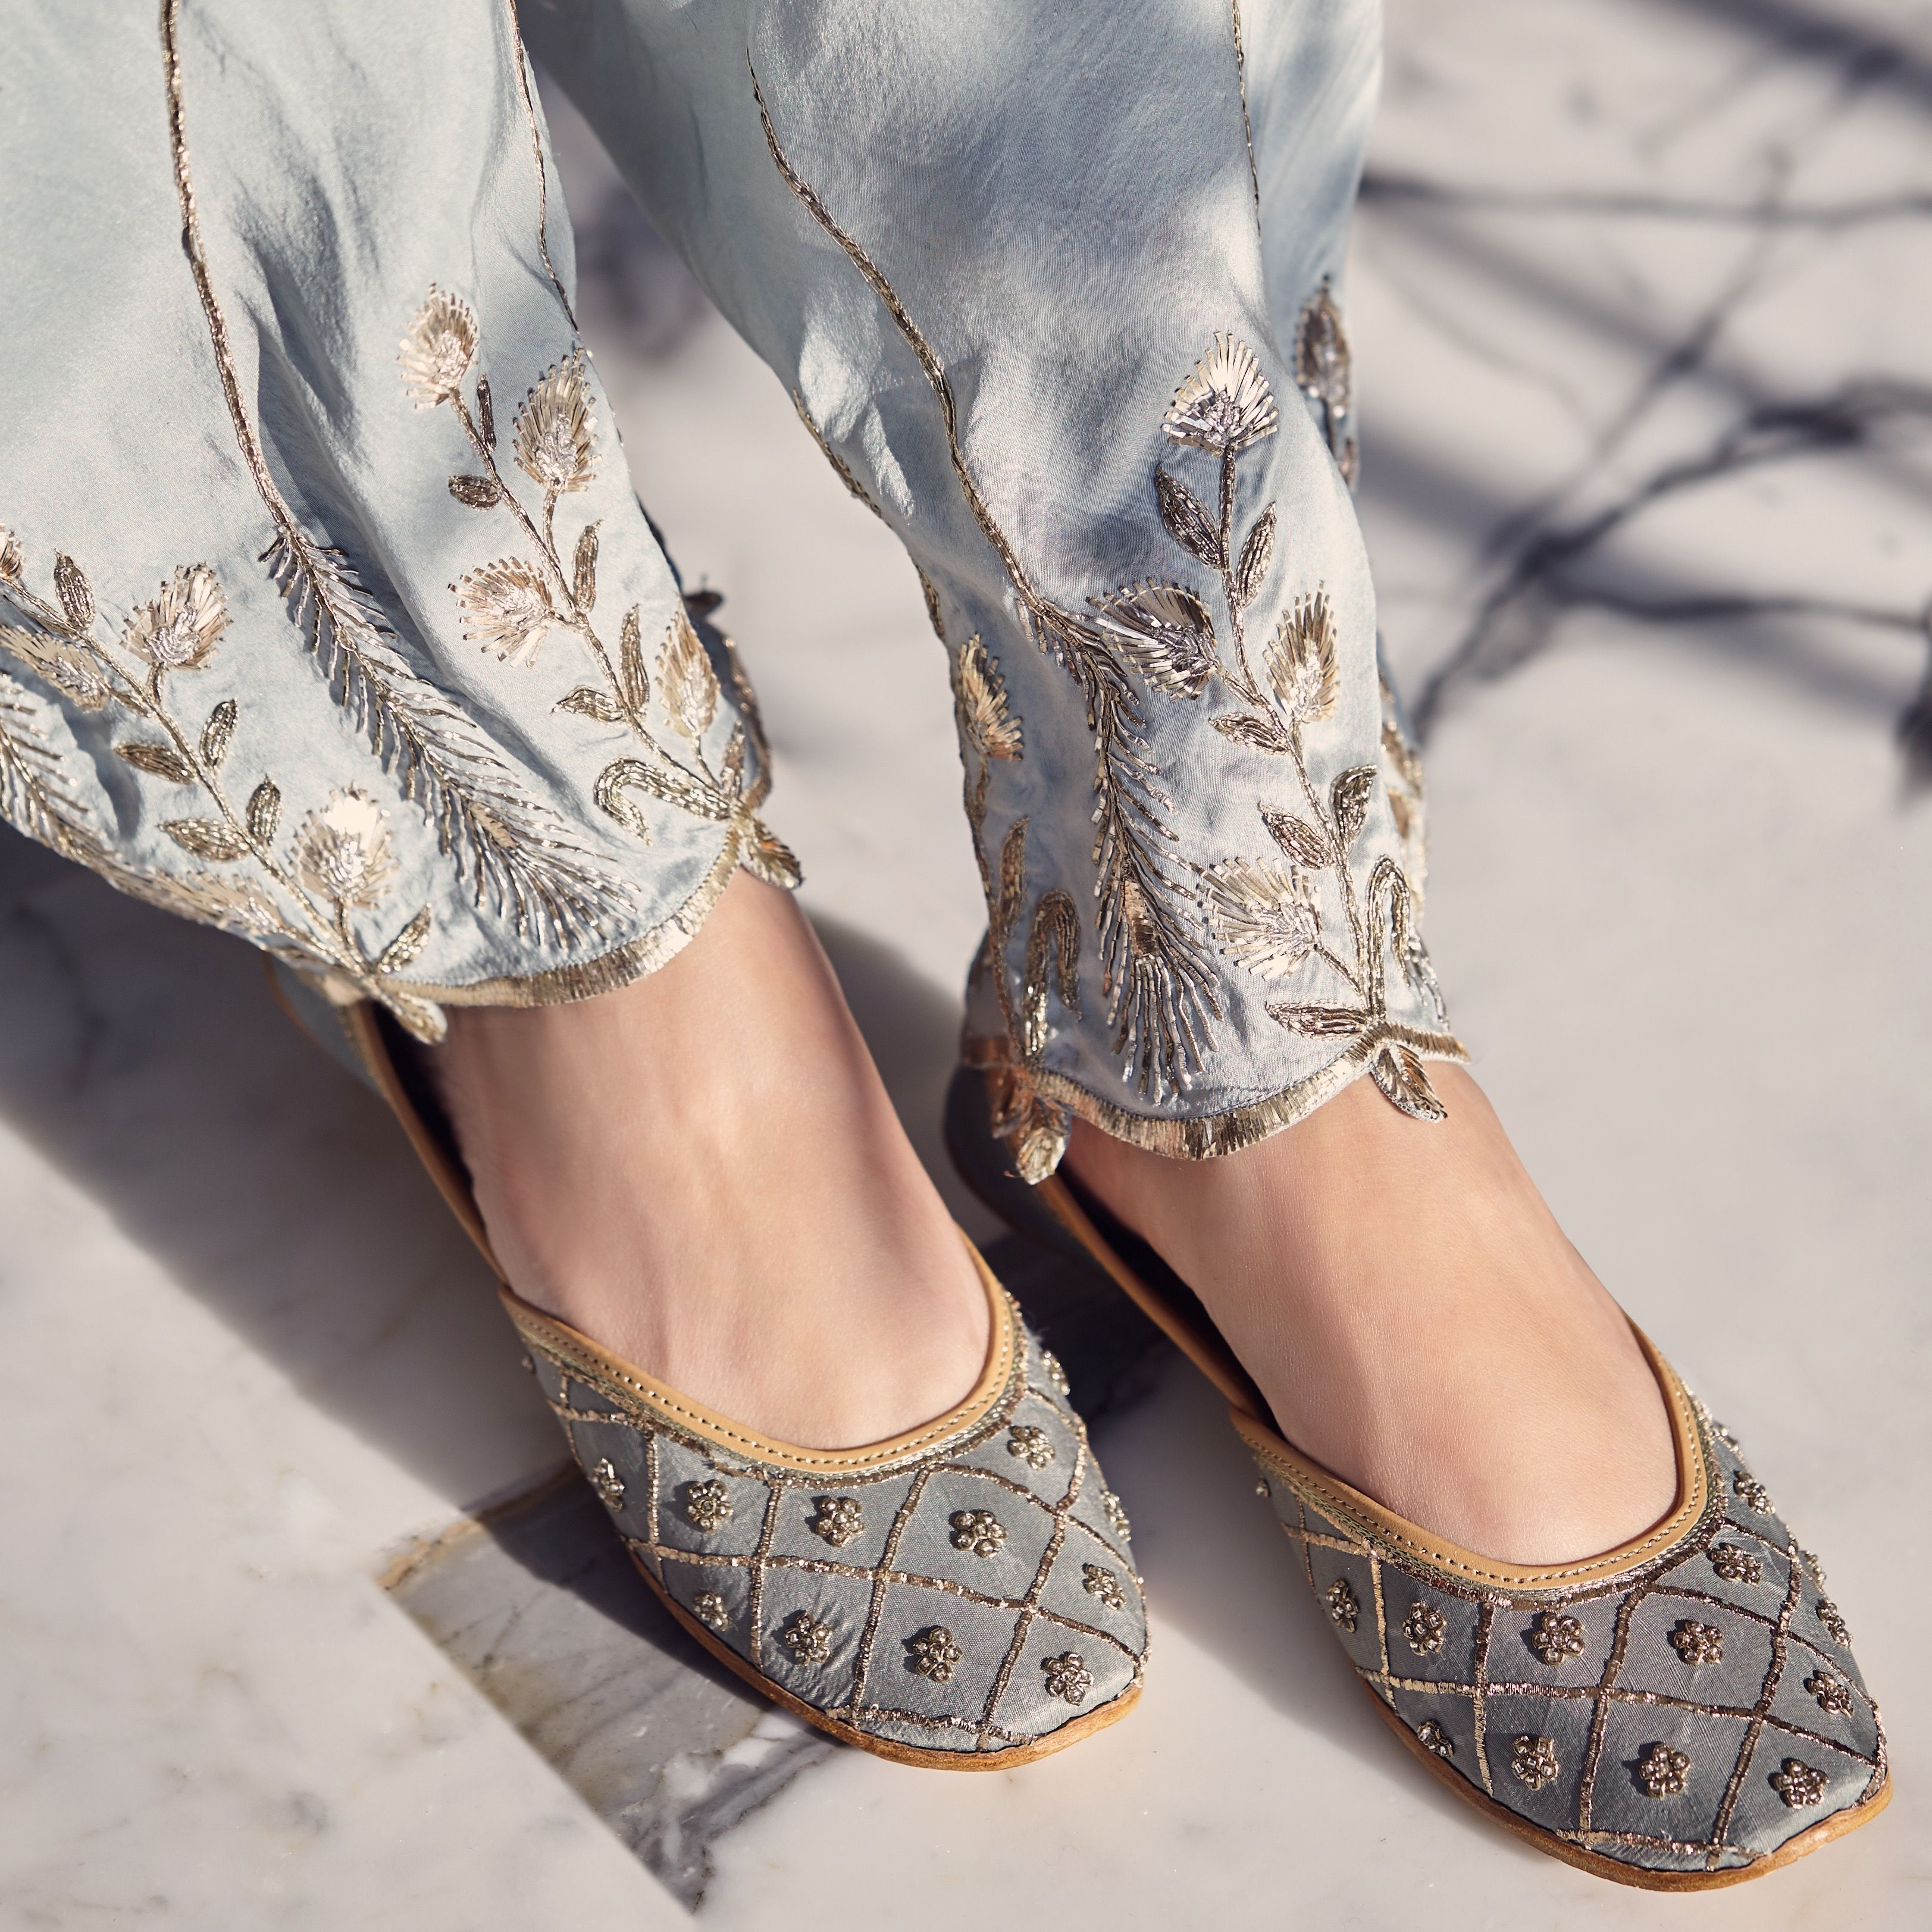 Indian shoes, Bride shoes, Indian